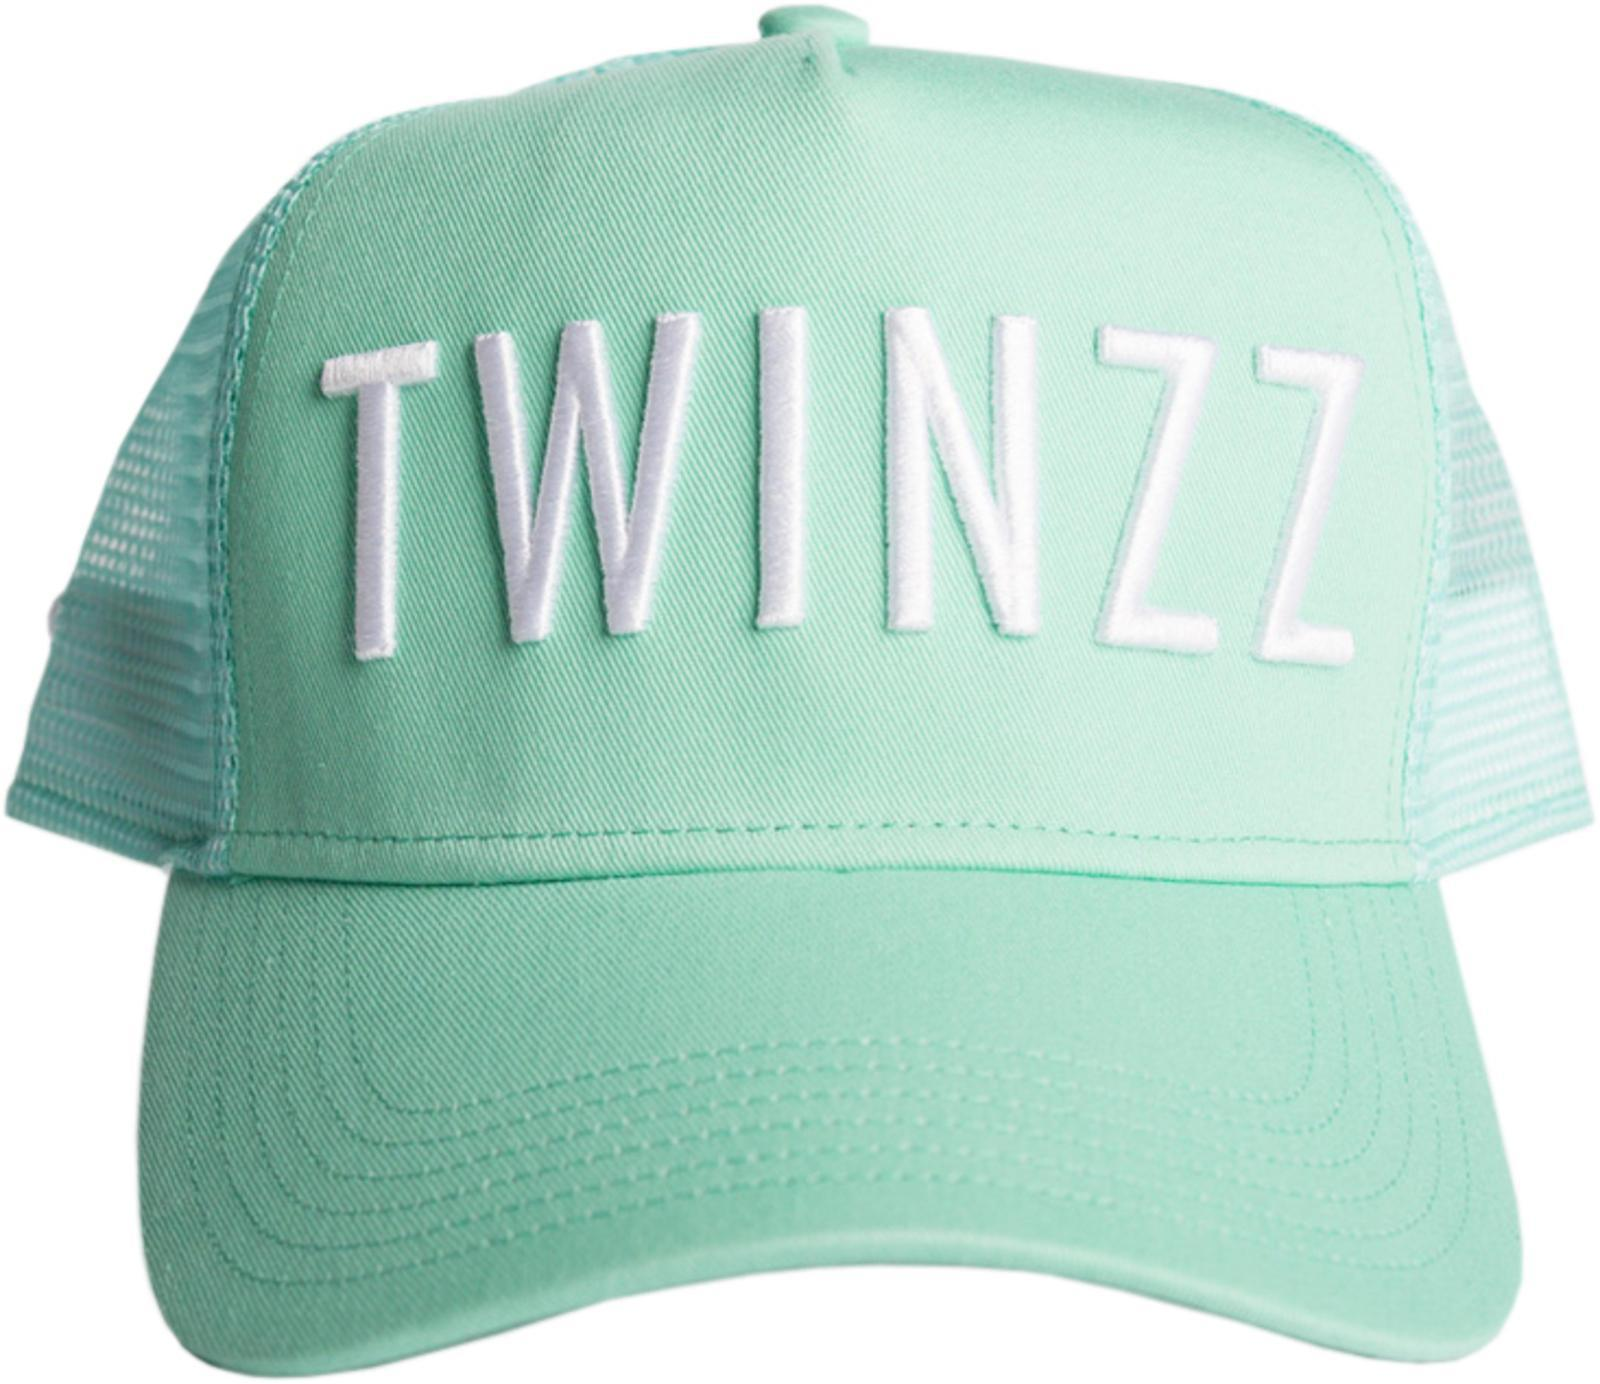 Twinzz 3d Mesh Trucker Adjustable Baseball Cap in Green - Lyst 53c856aaca